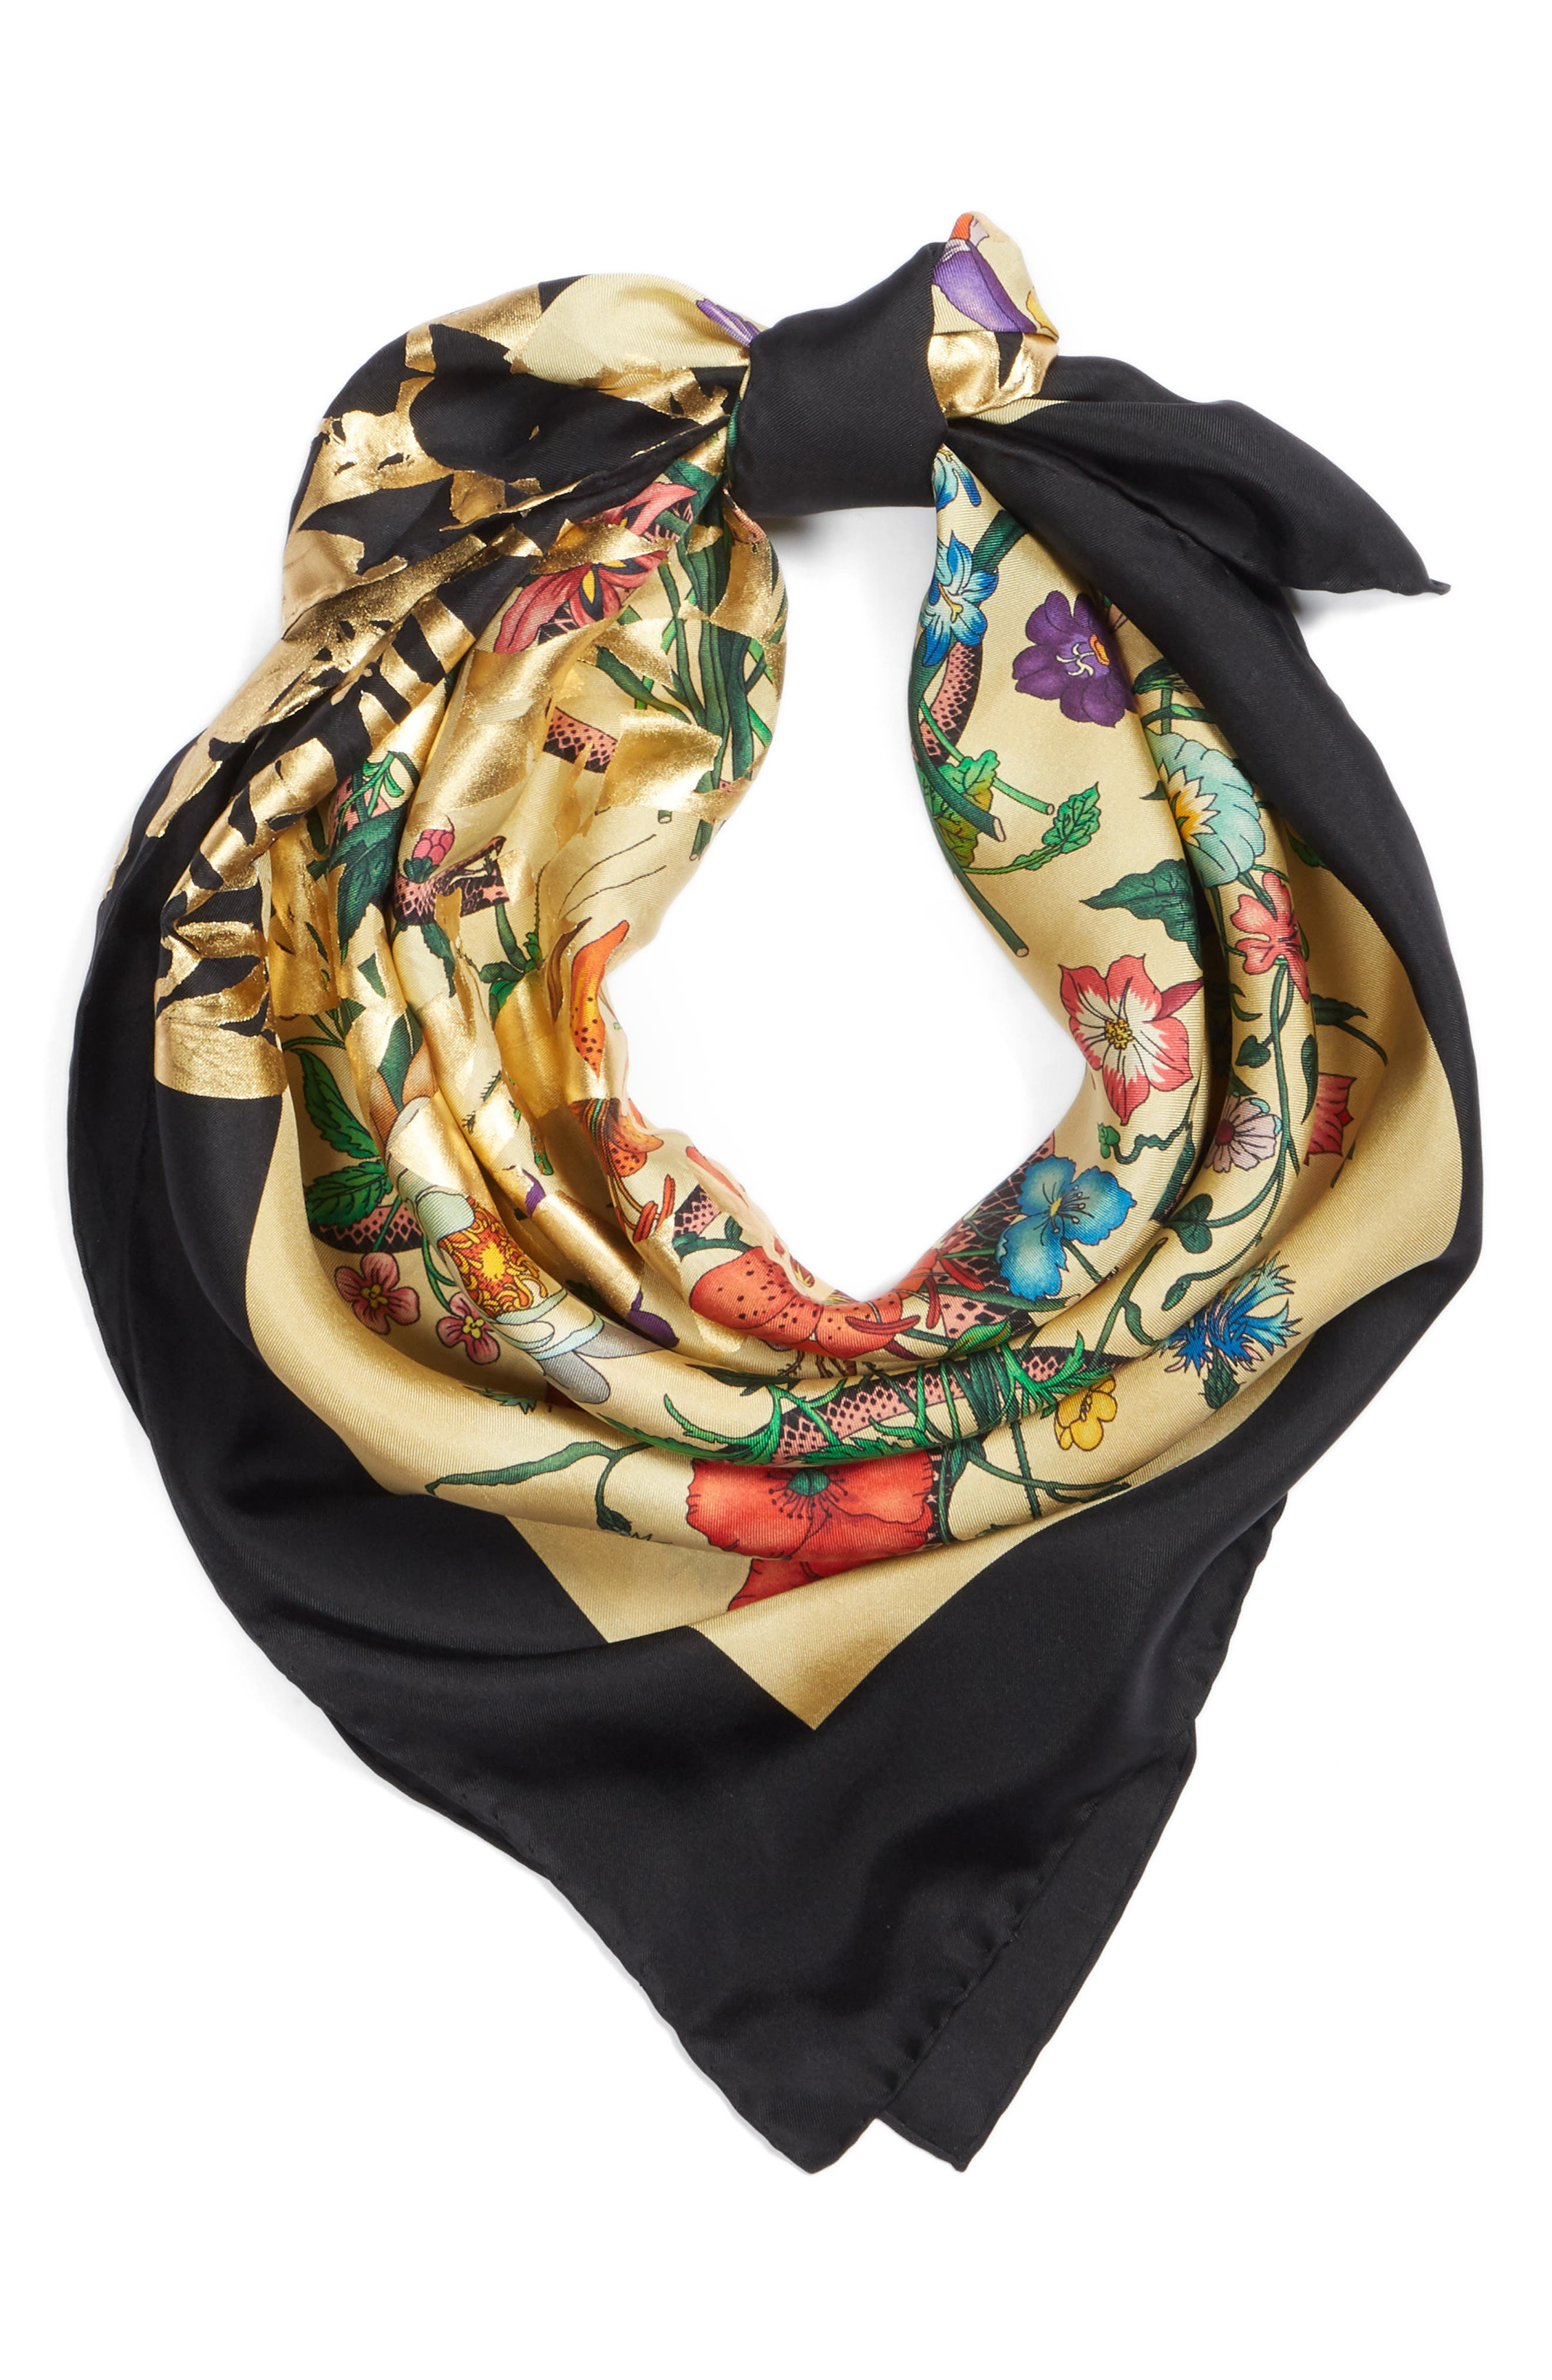 Gold Snake Foulard Silk Scarf,                             Alternate thumbnail 2, color,                             900